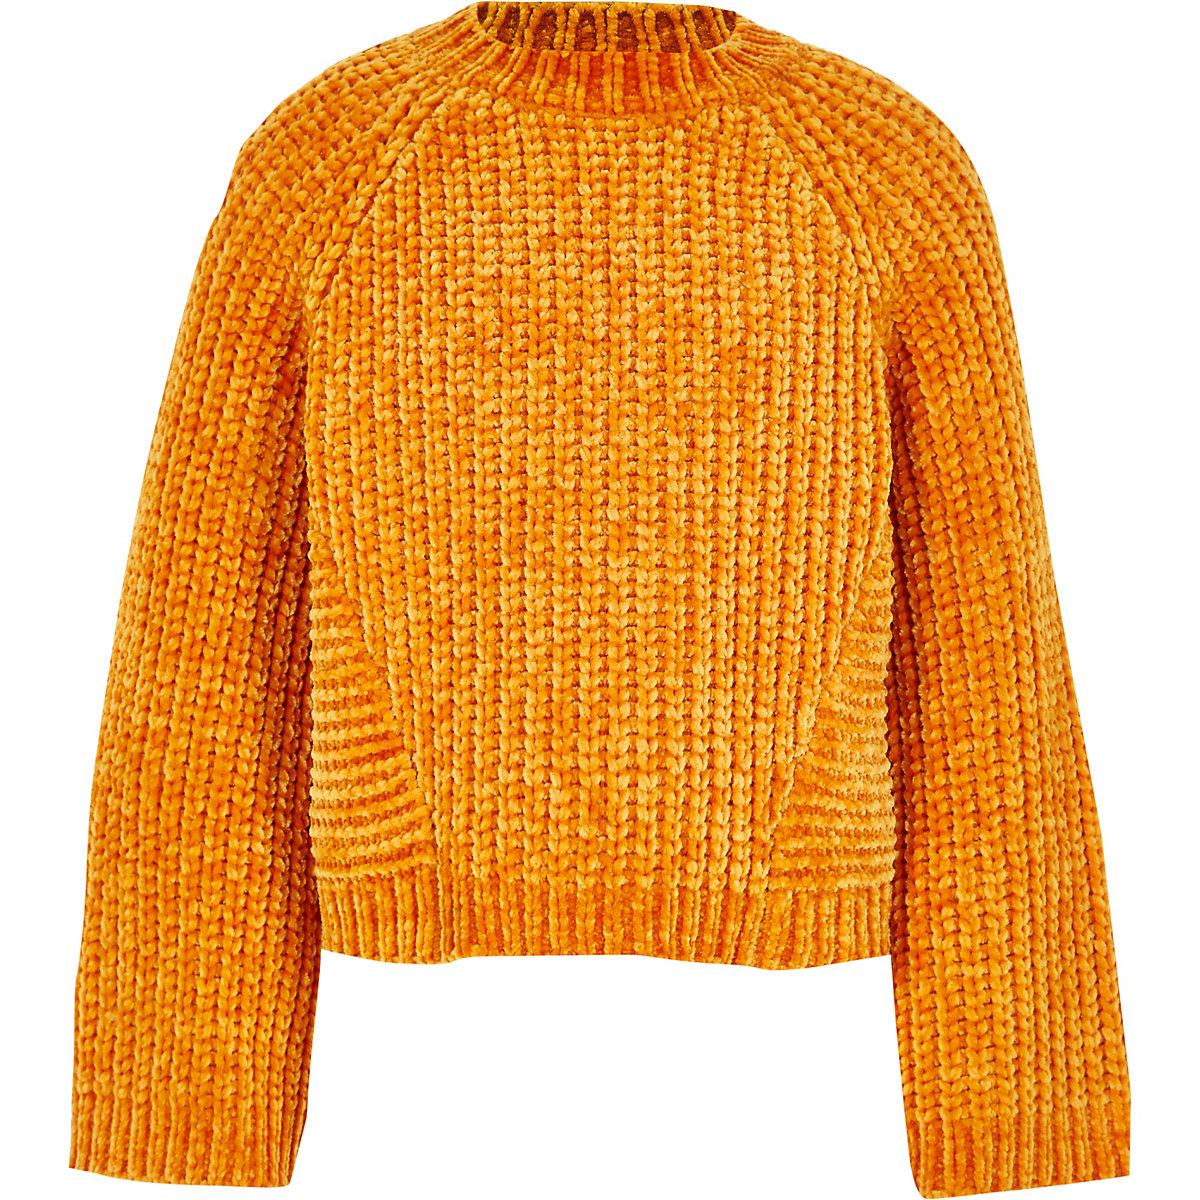 Girls orange chenille knit sweater